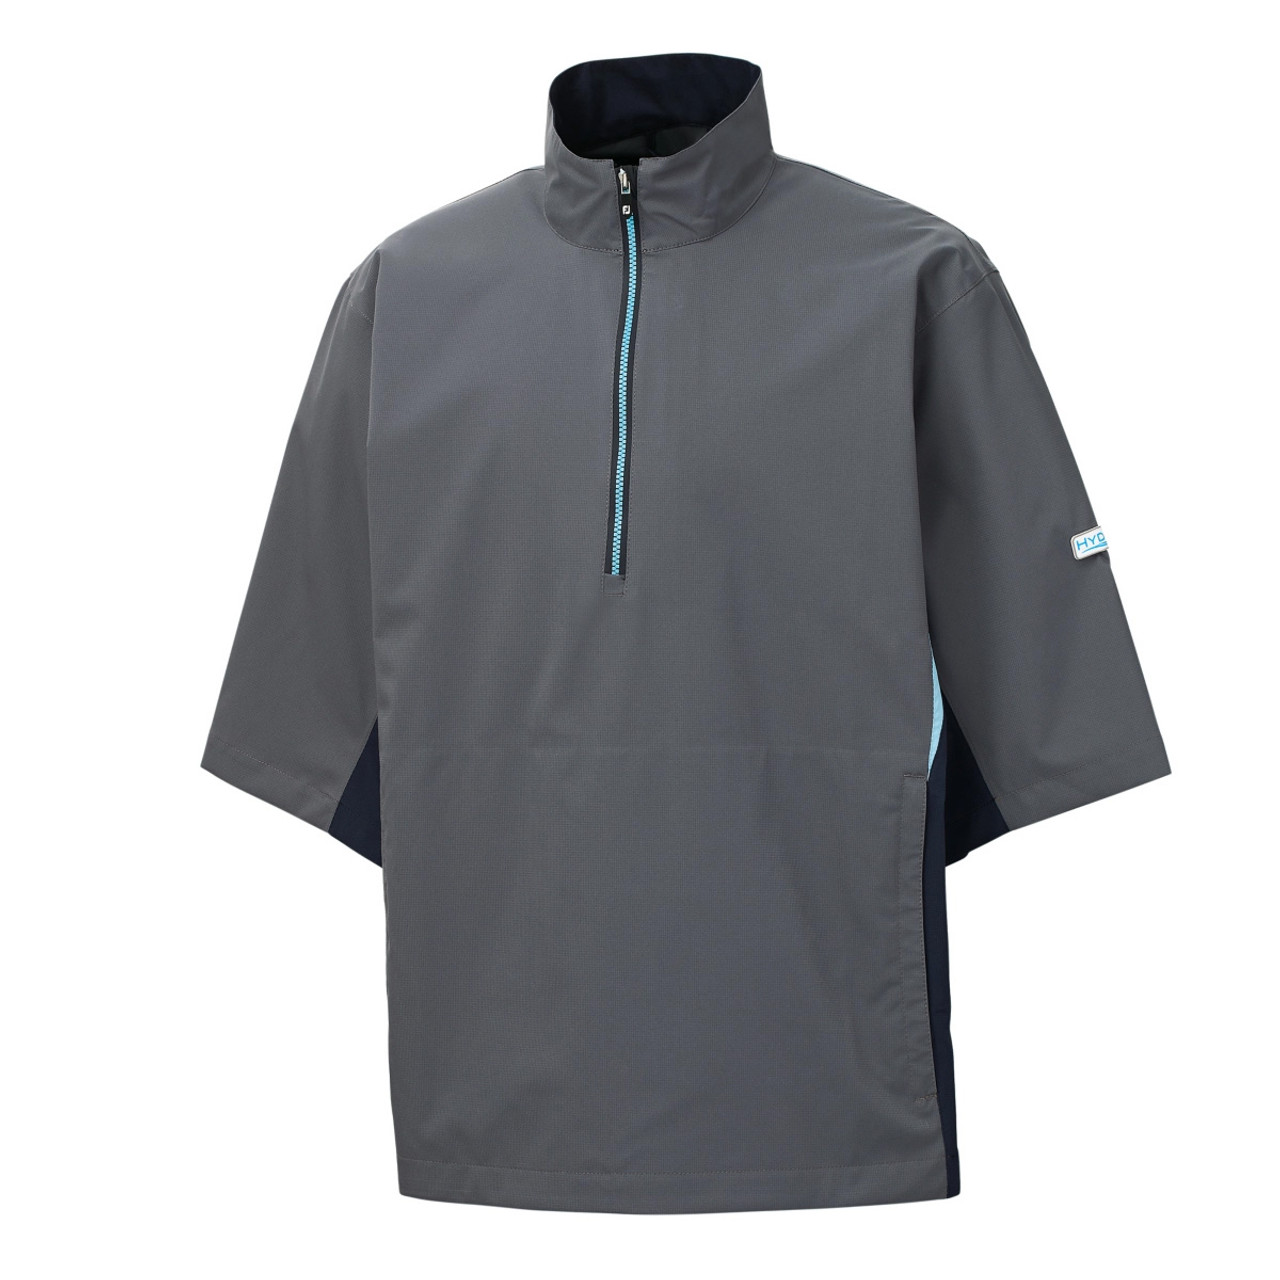 FootJoy FJ Hydrolite Short Sleeve Rain Shirt - Charcoal / Navy / Light Blue (23797)